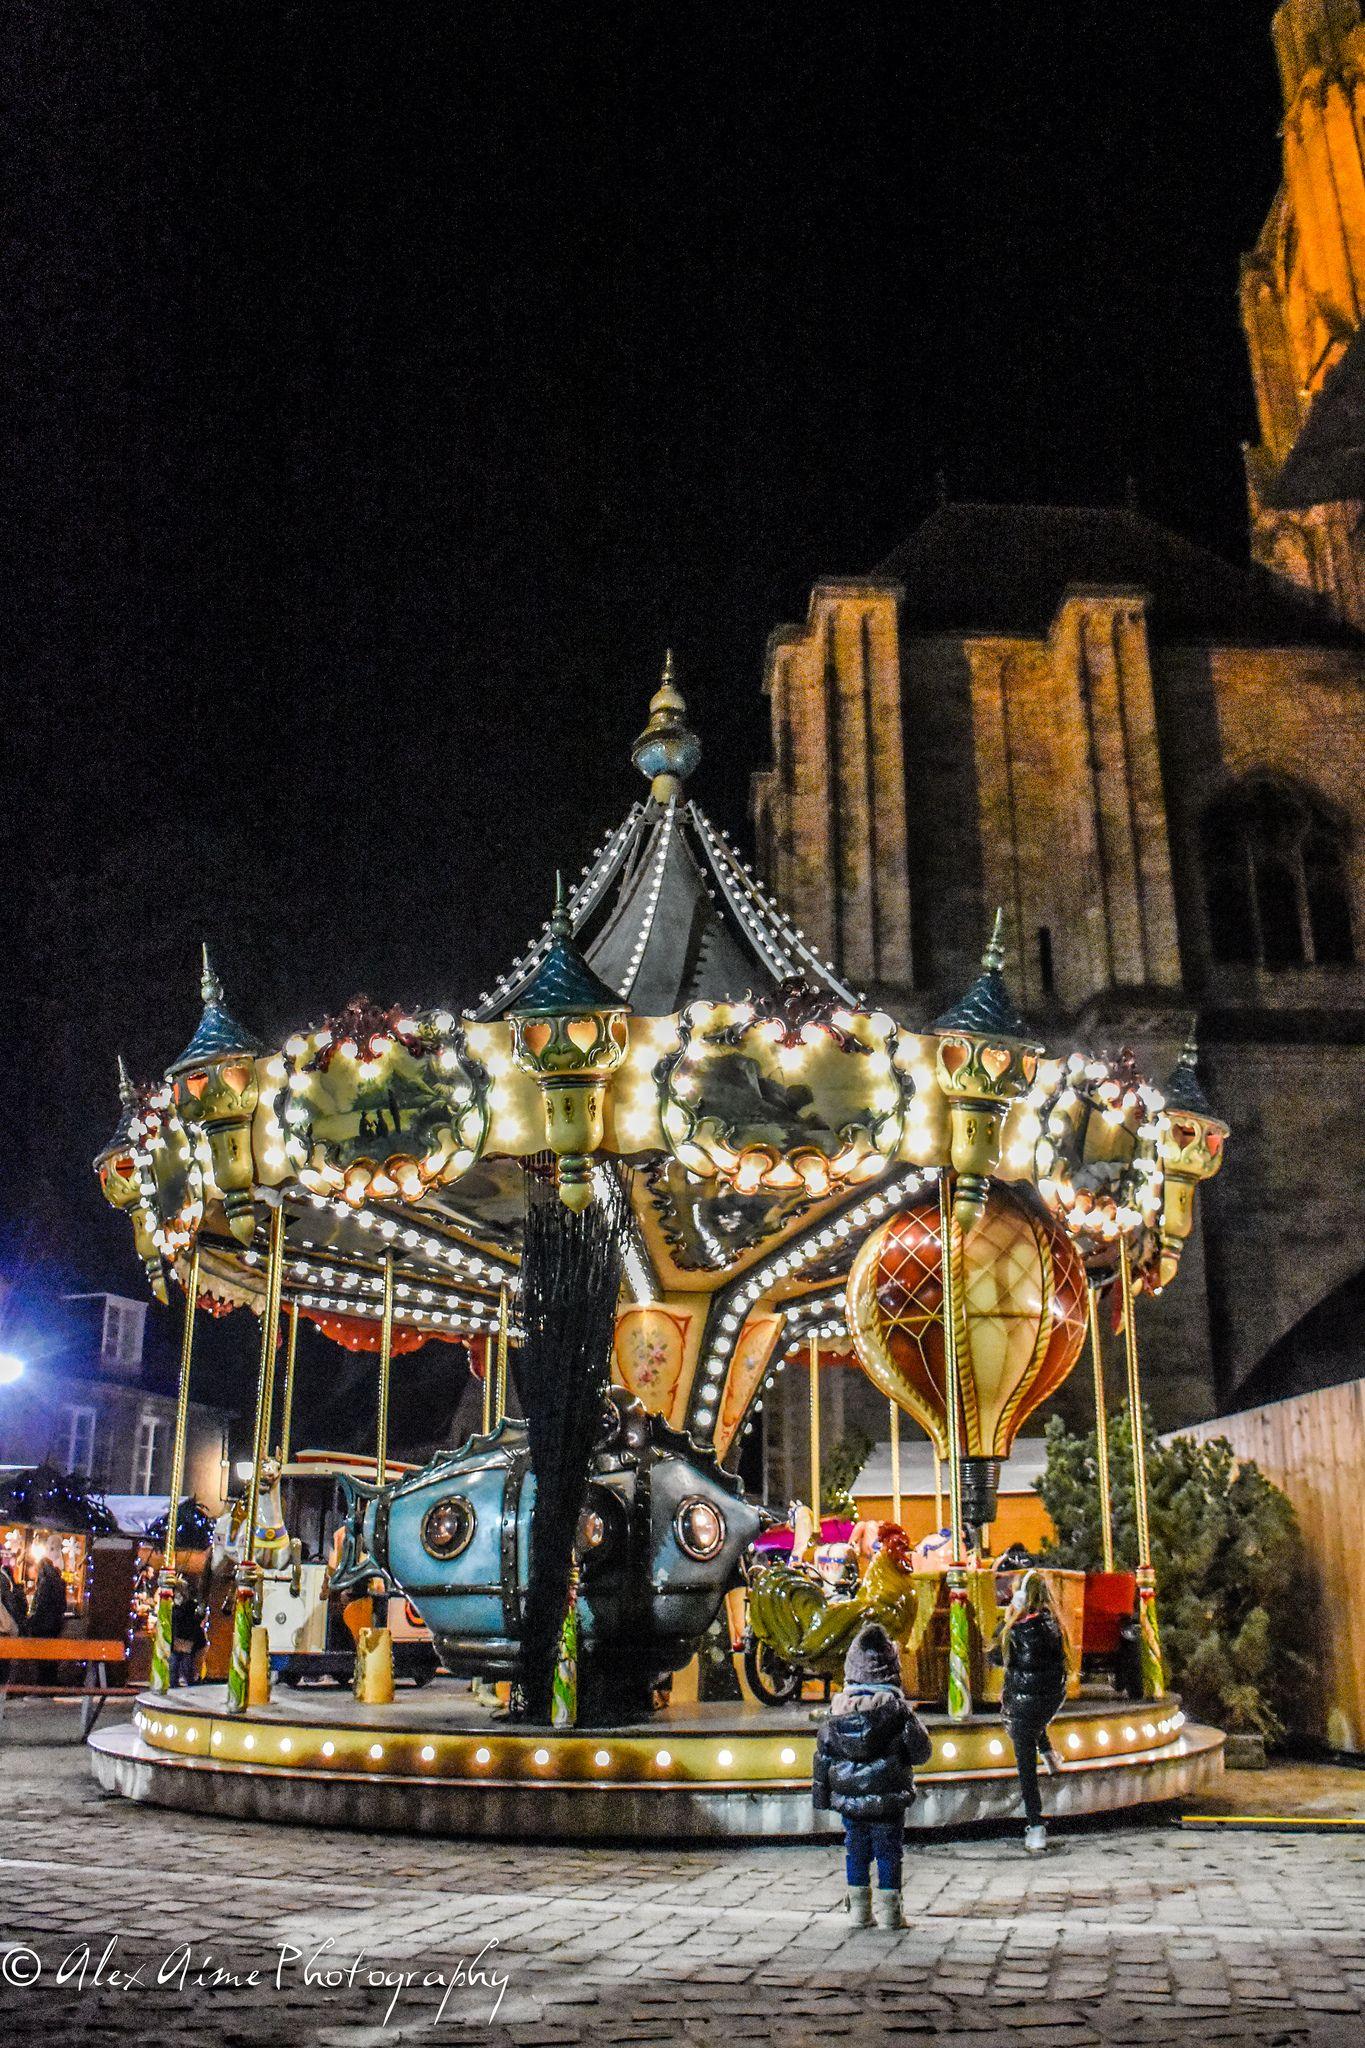 308/365 Carousel Christmas market Bourges Ville france